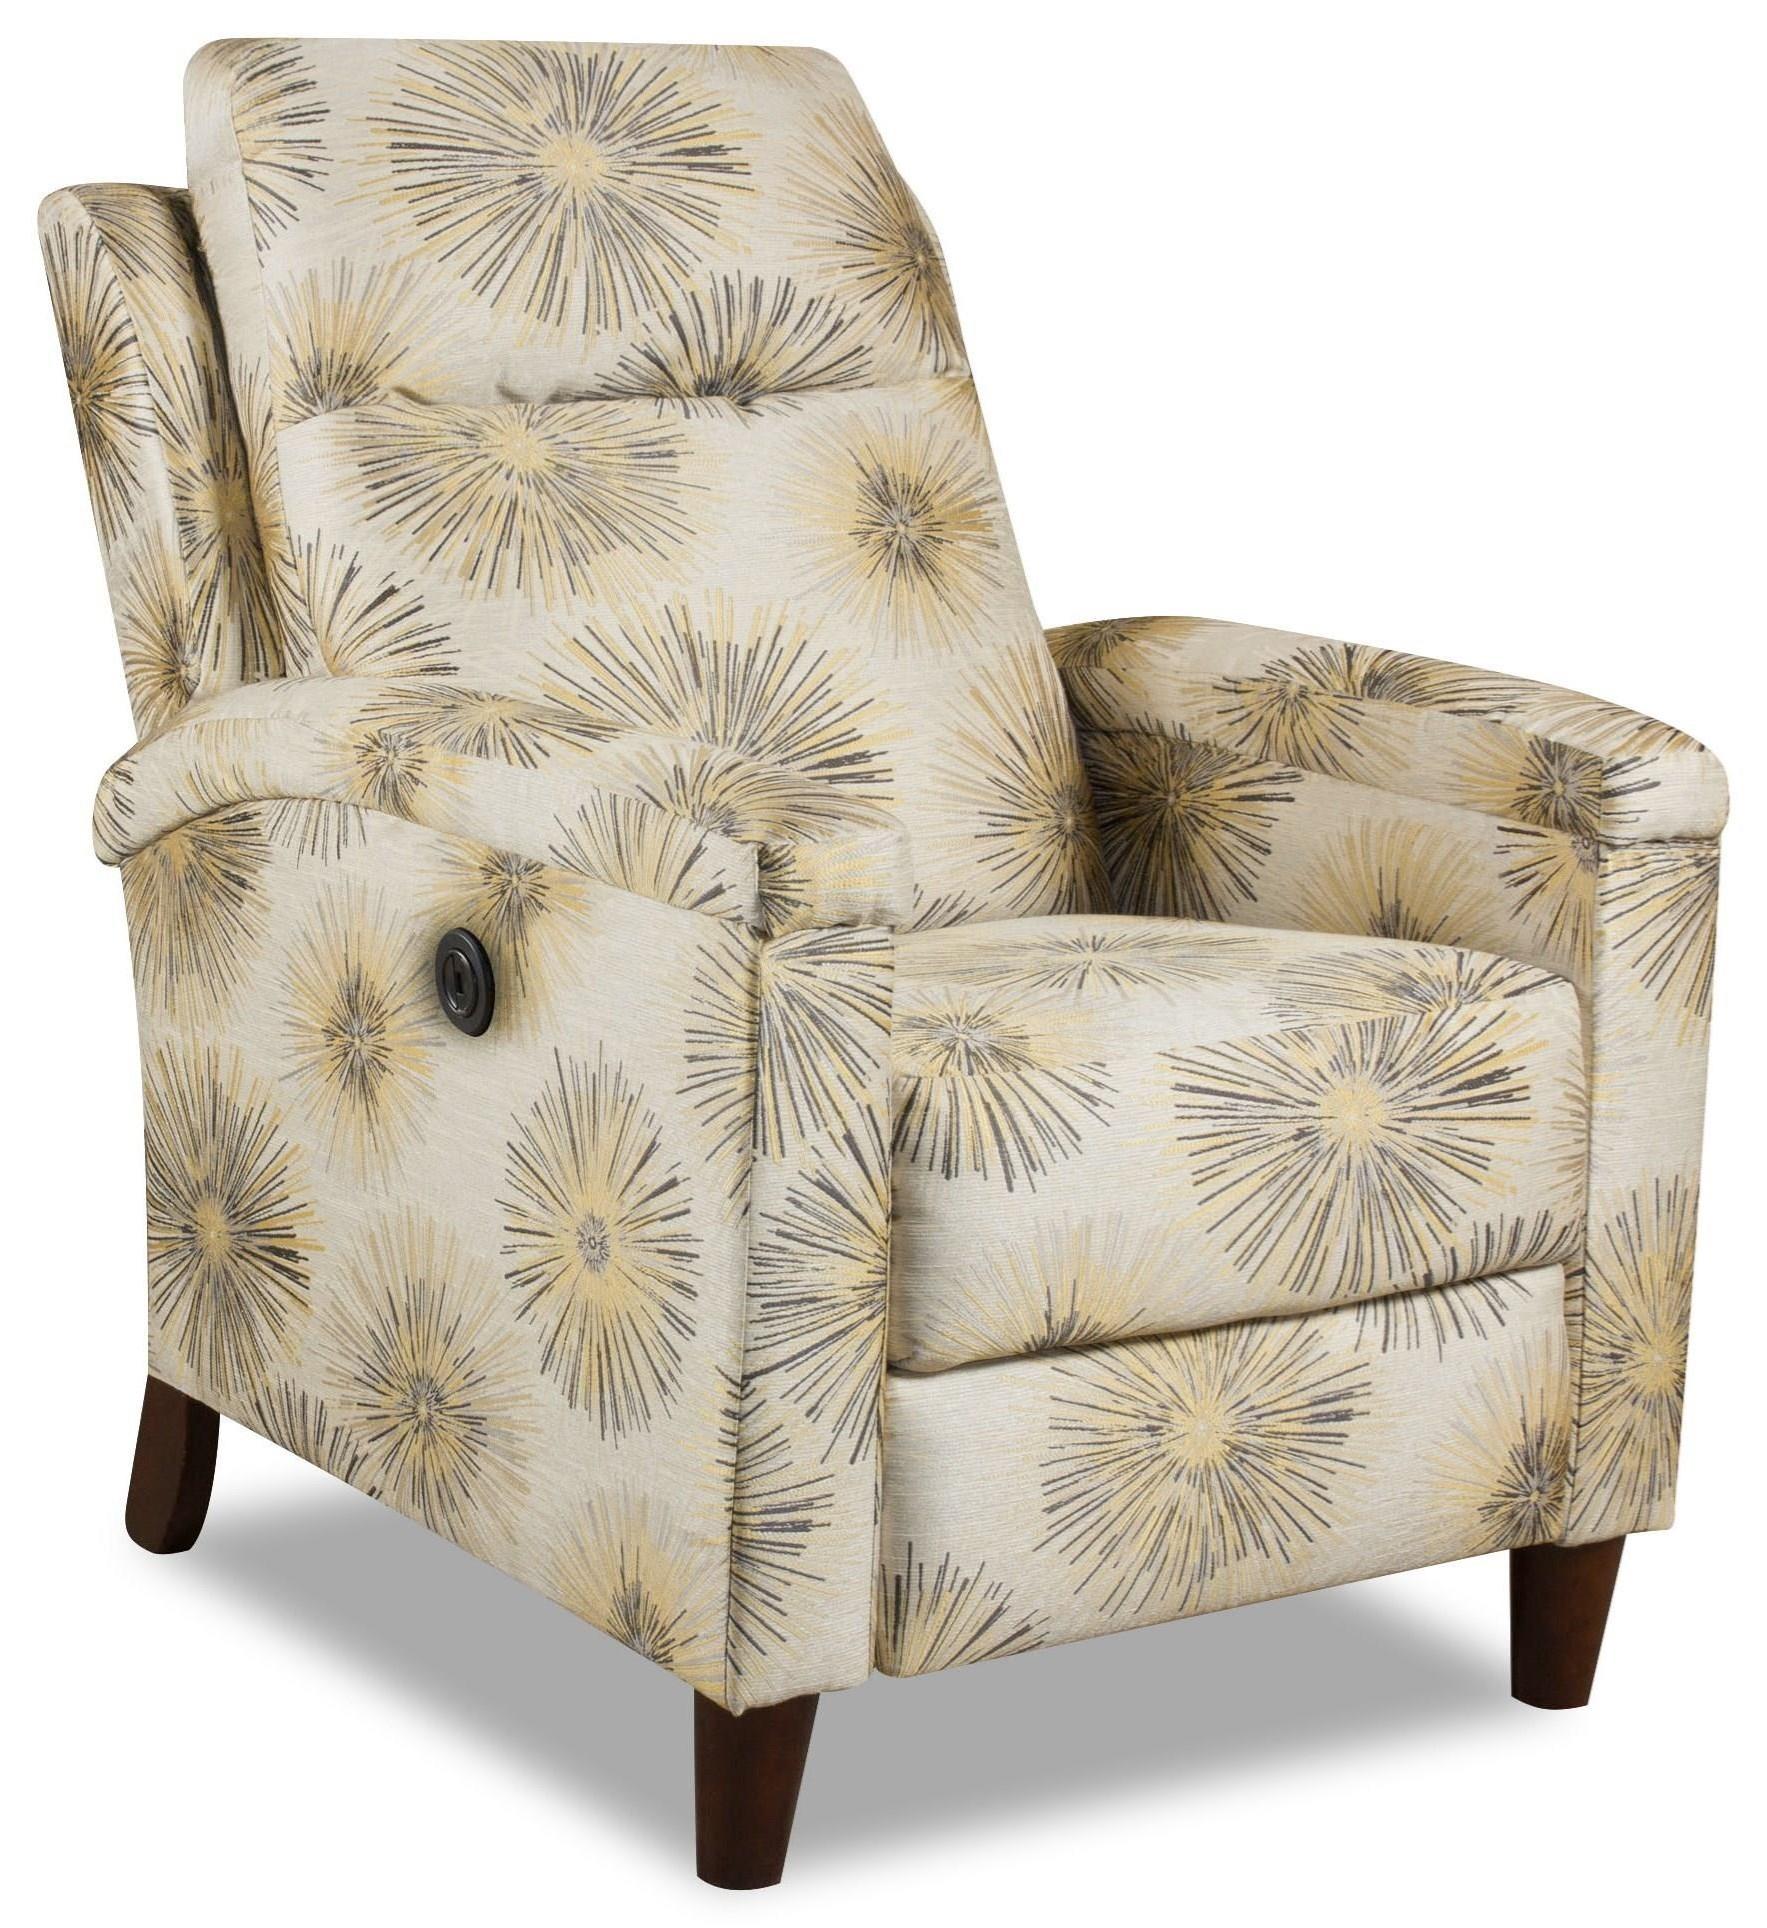 Glitz Hi-Leg Recliner by Southern Motion at Crowley Furniture & Mattress